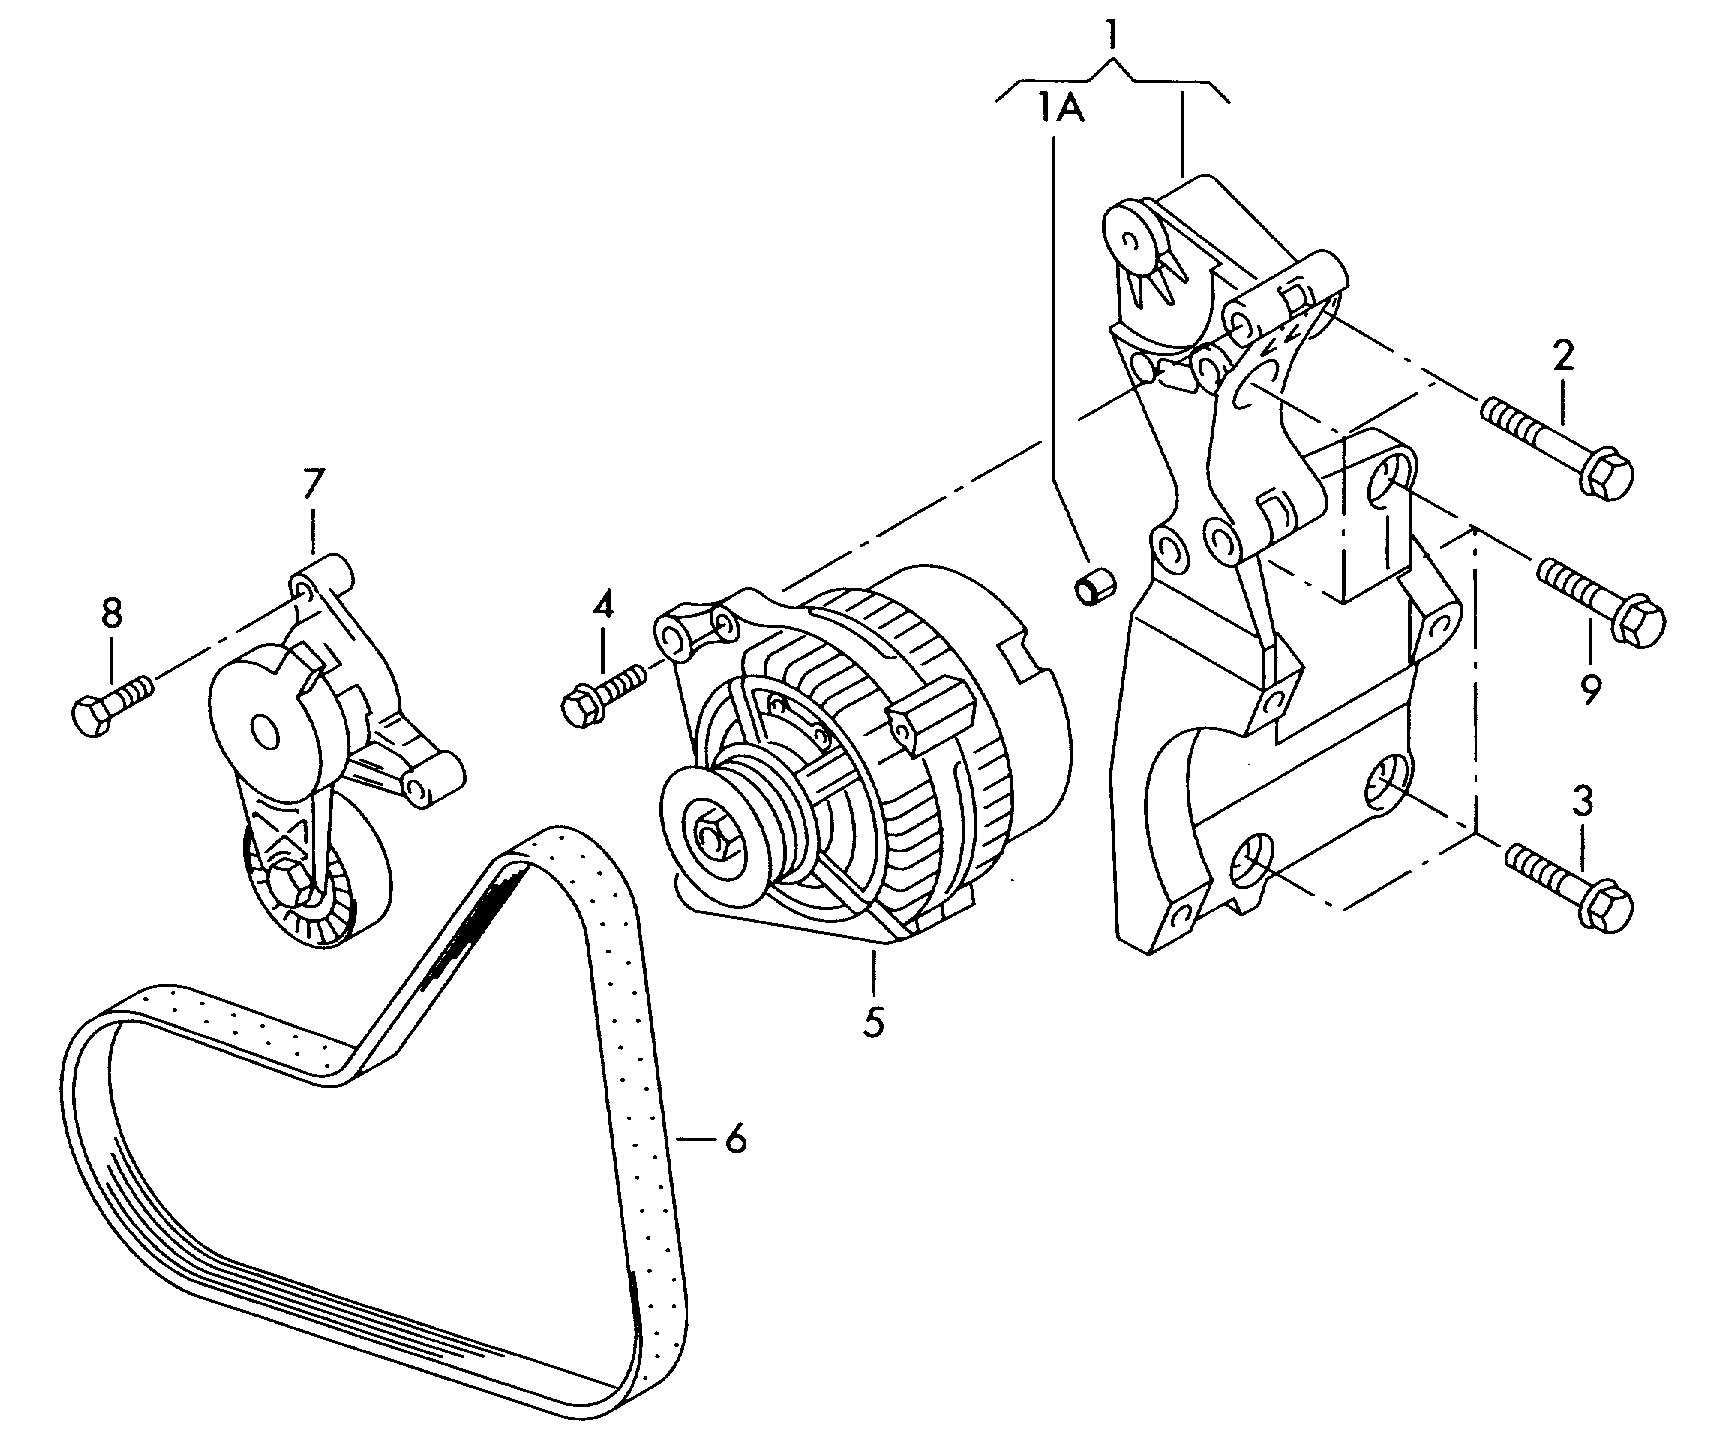 Volkswagen Jetta Bracket for generator and refrigerant